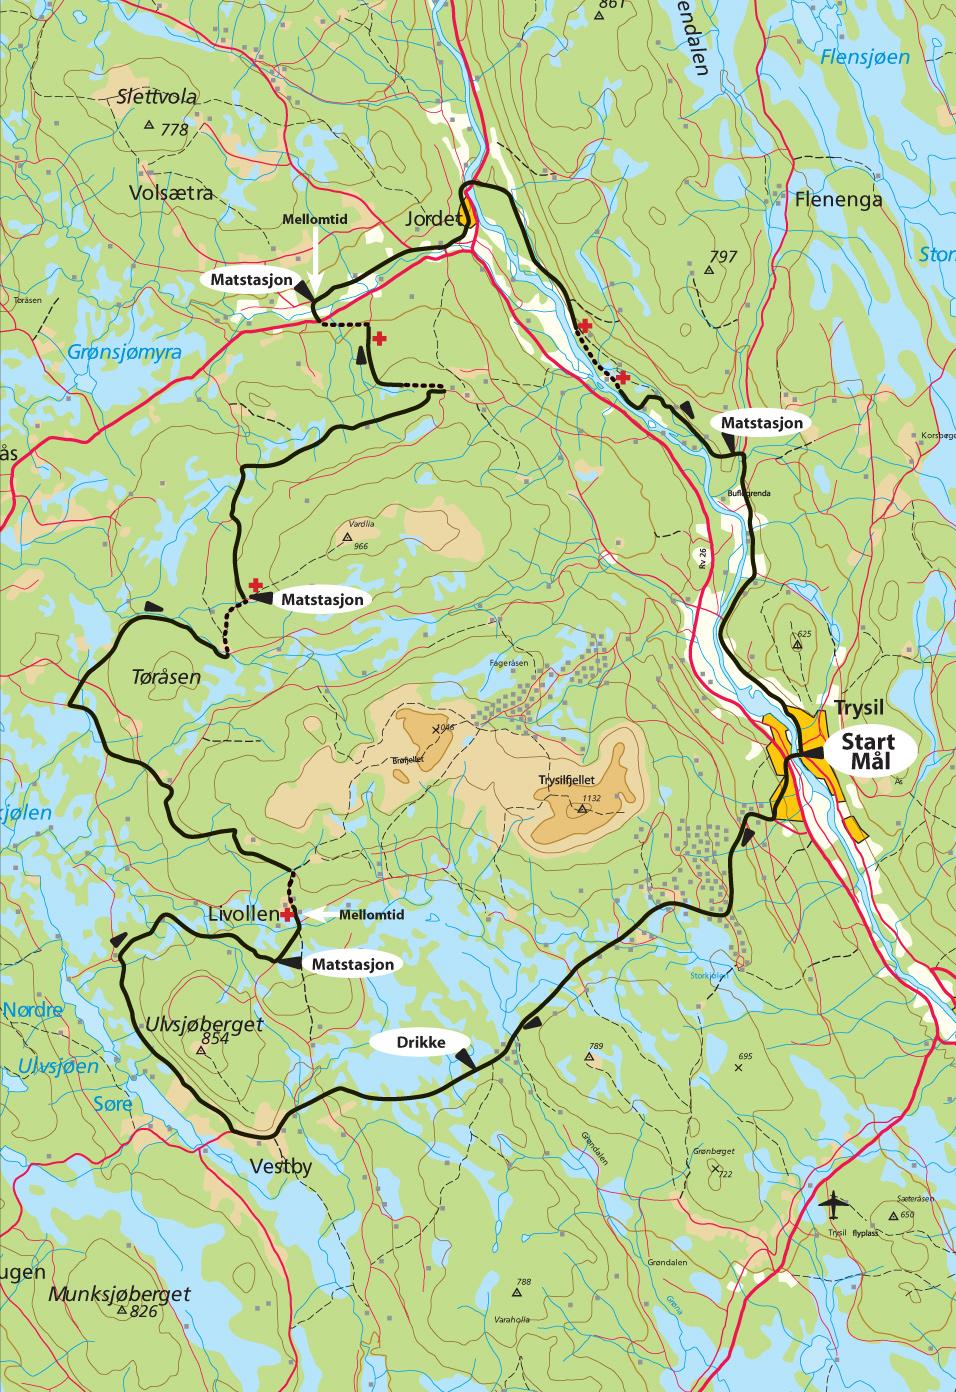 kart over trysil Løypa   Trysil kart over trysil